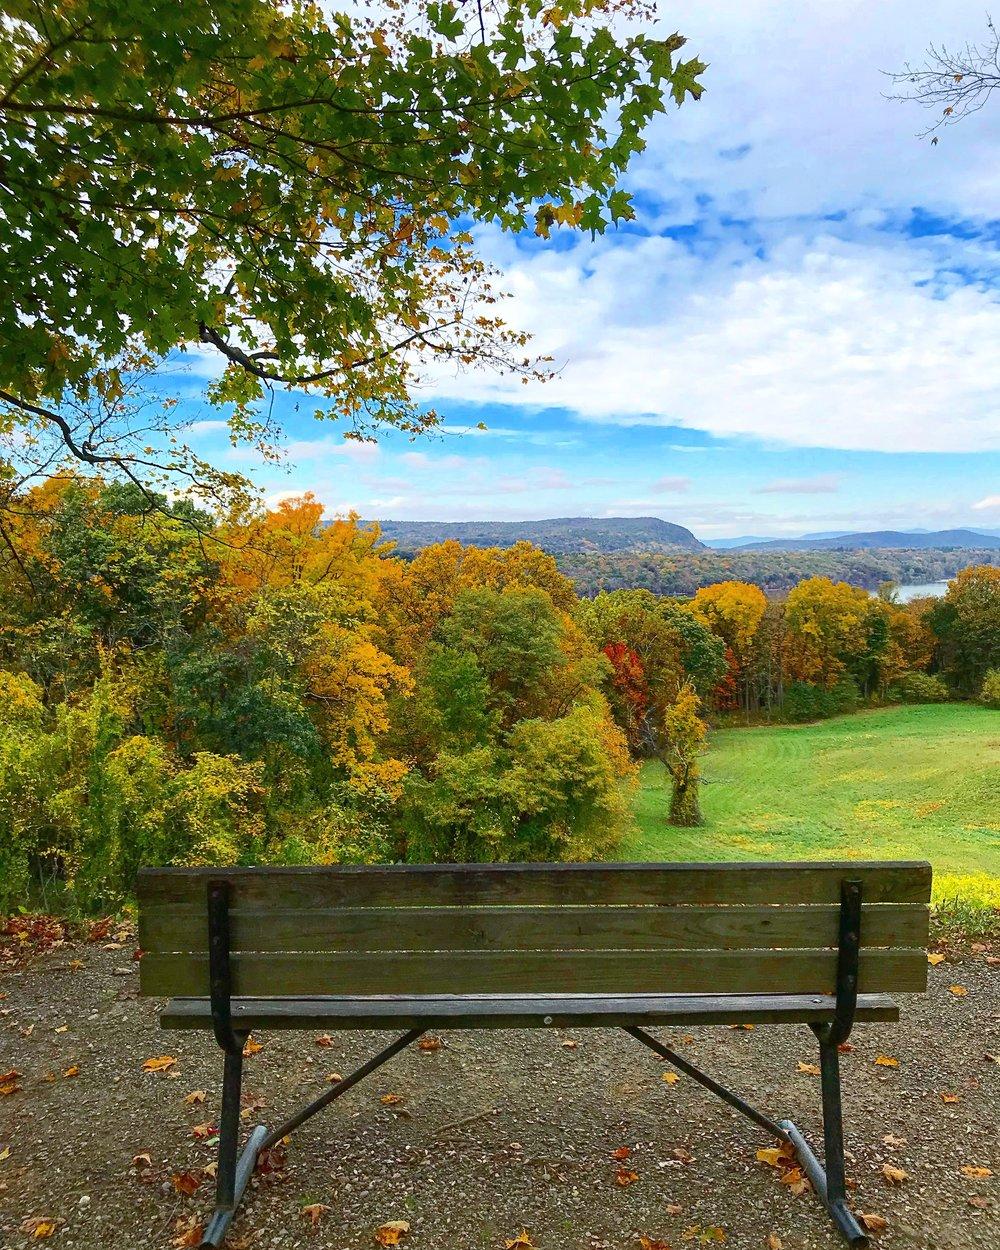 Vanderbilt Mansion Park, Bench with a view, Hyde Park, NY - October 25th 2017.